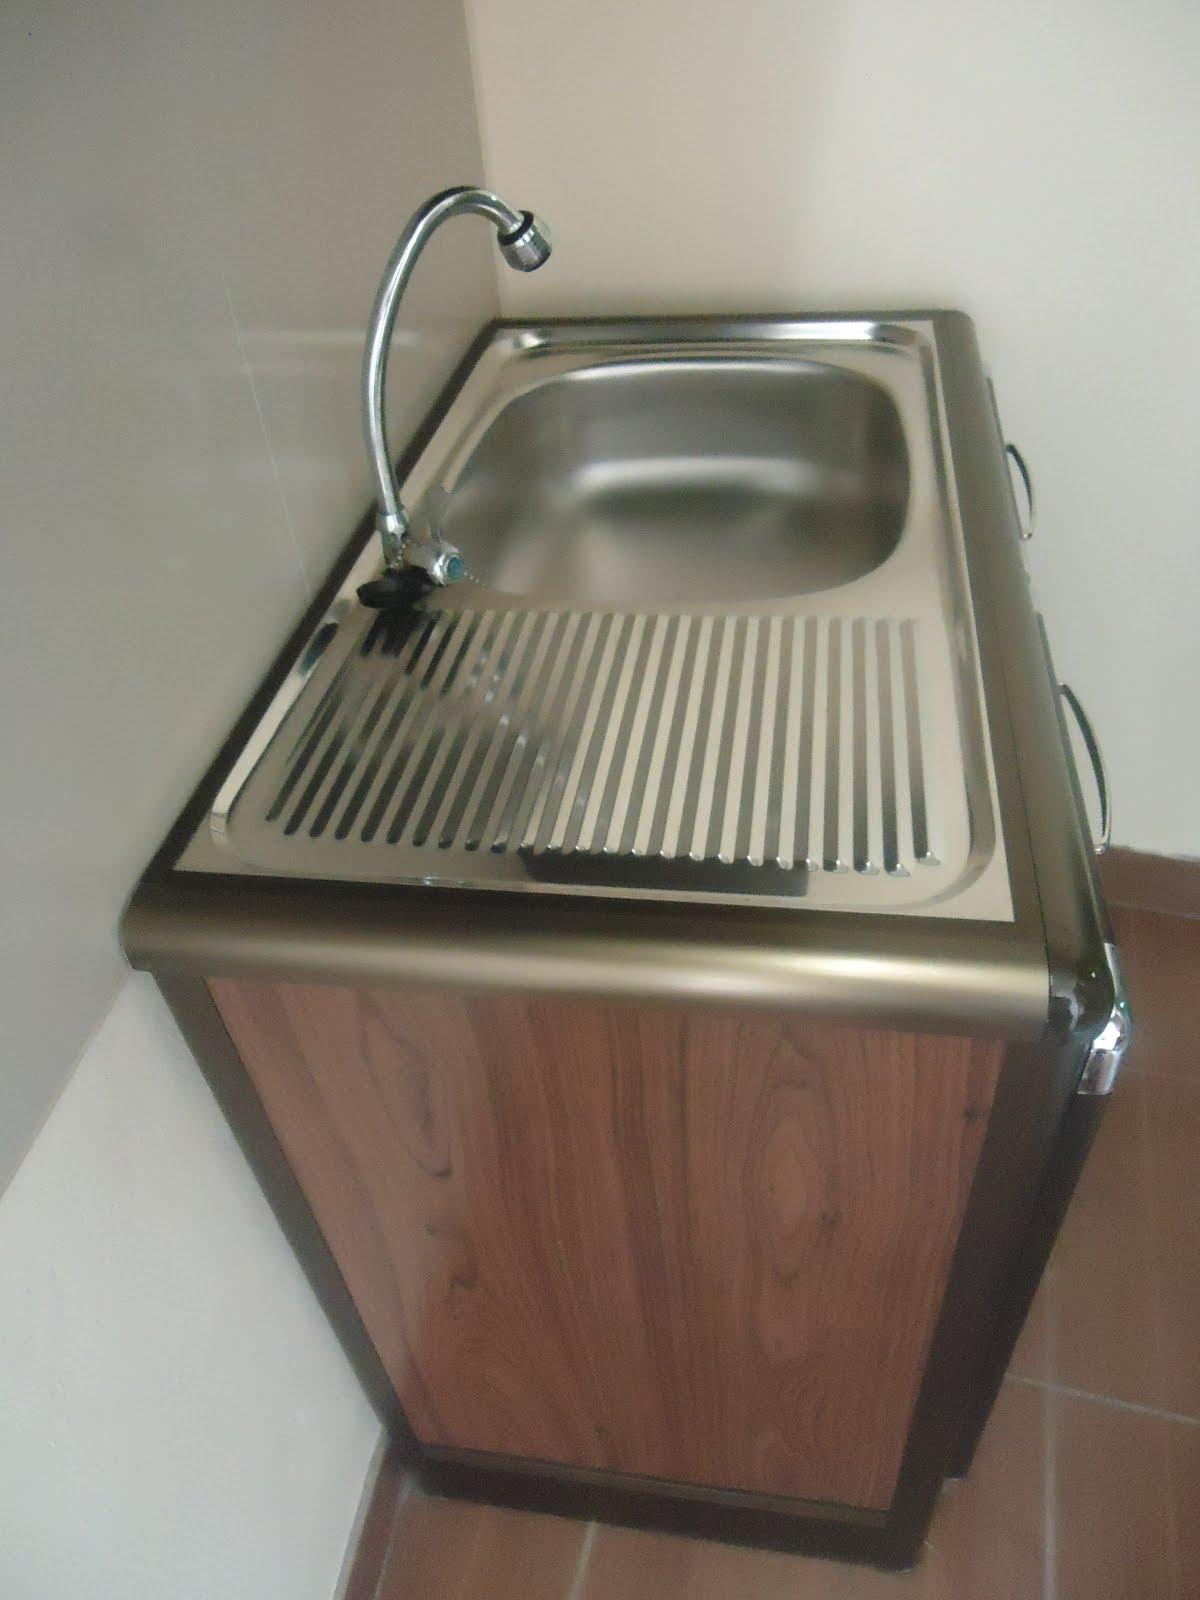 Portable kitchen sink photo - 2